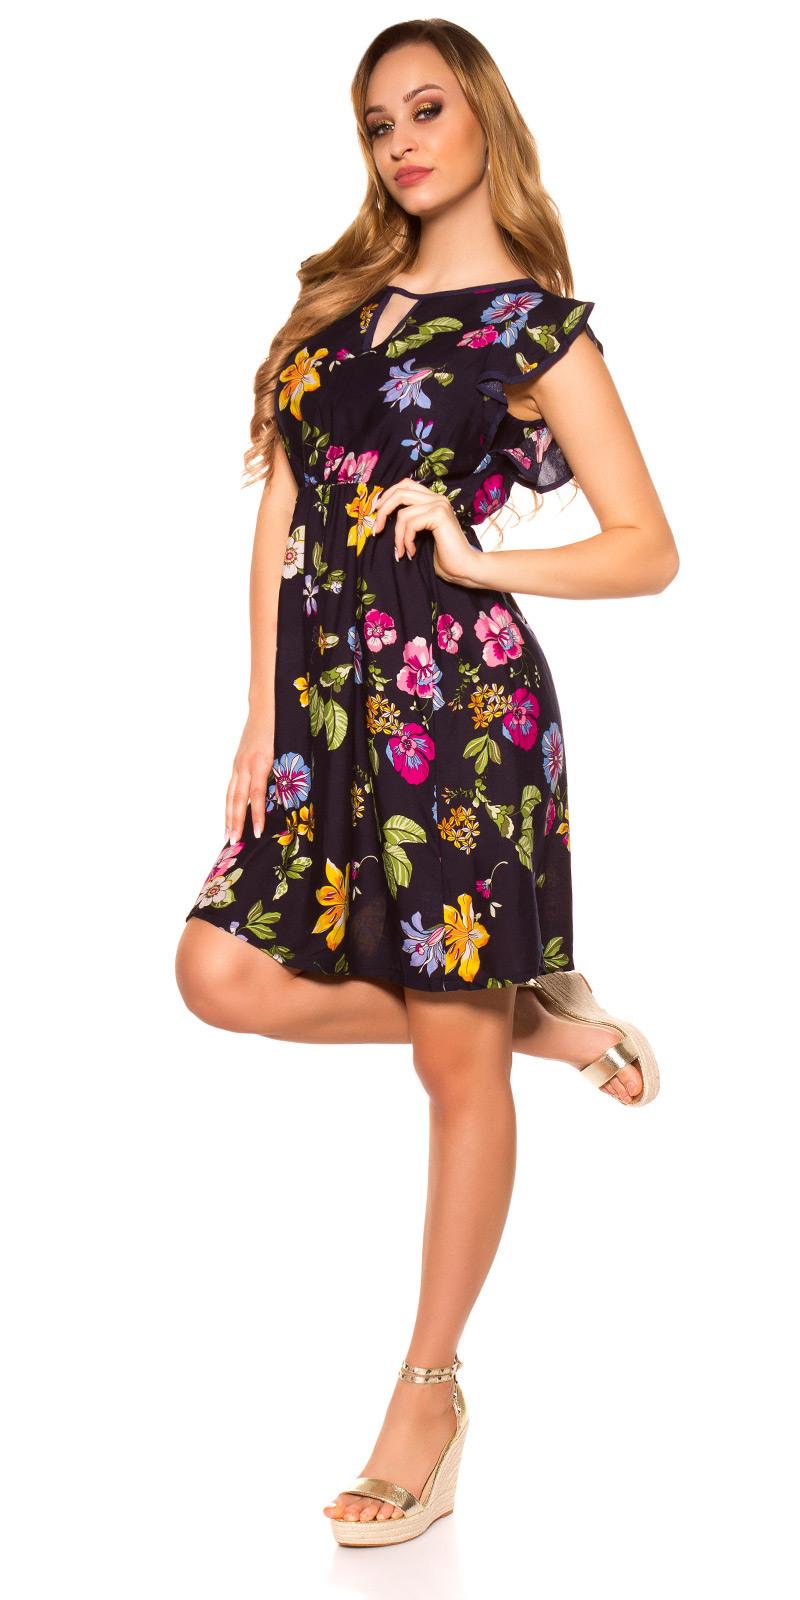 Sexy Sommer Minikleid Mit Blumenprint  Navy  Néamoda